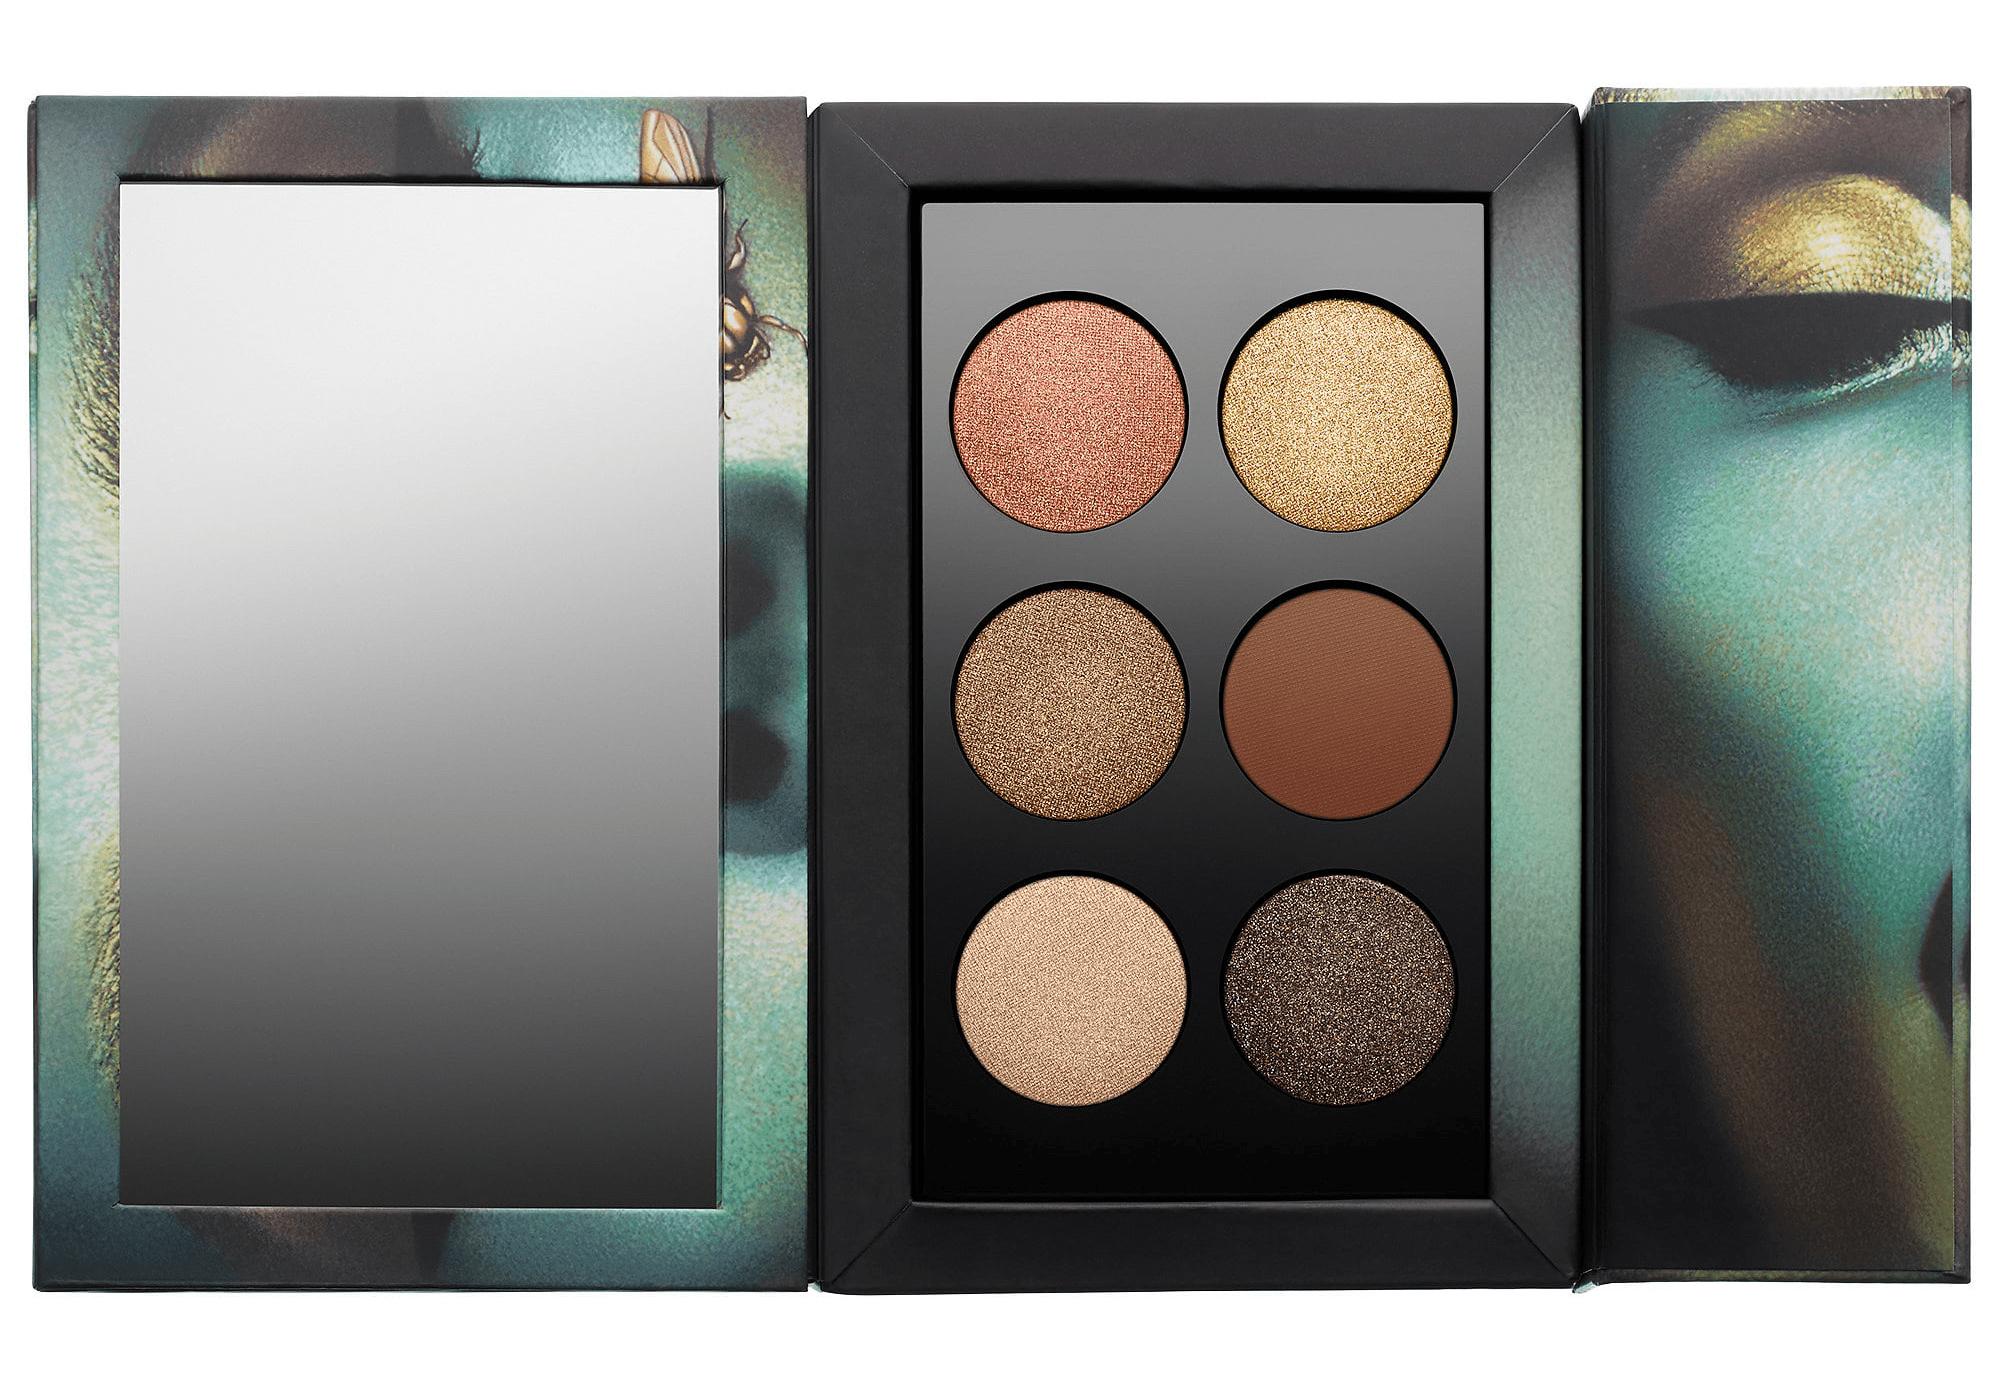 pat_mcgrath_labs_MTHRSHP_Sublime_Bronze_Ambition_Eyeshadow_Palette